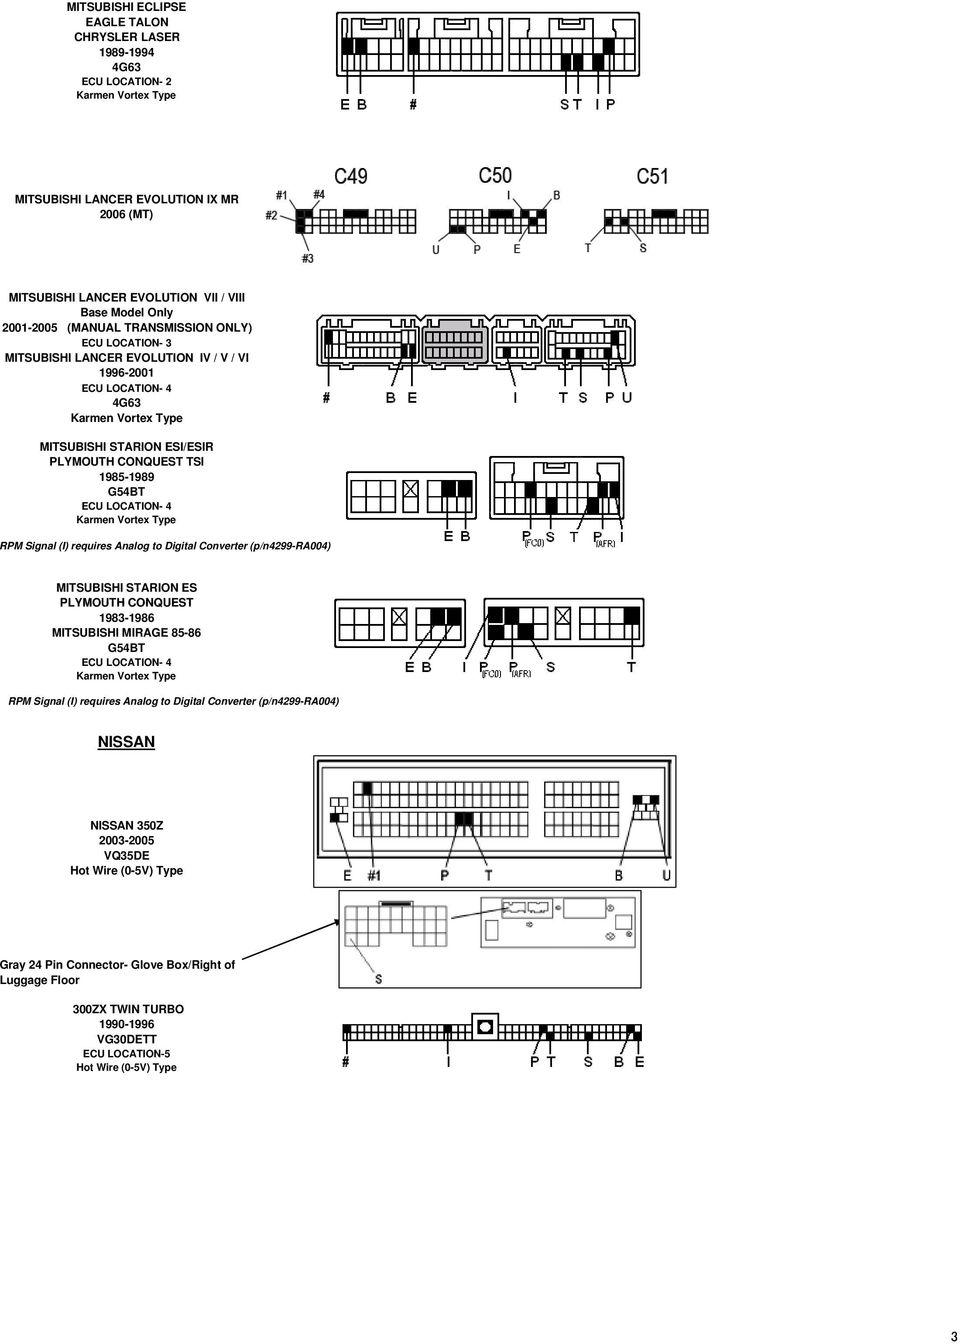 subaru legacy ecu wiring diagram vauxhall zafira fuse box 2007 vehicle specific pdf signal i requires analog to digital converter p n4299 ra004